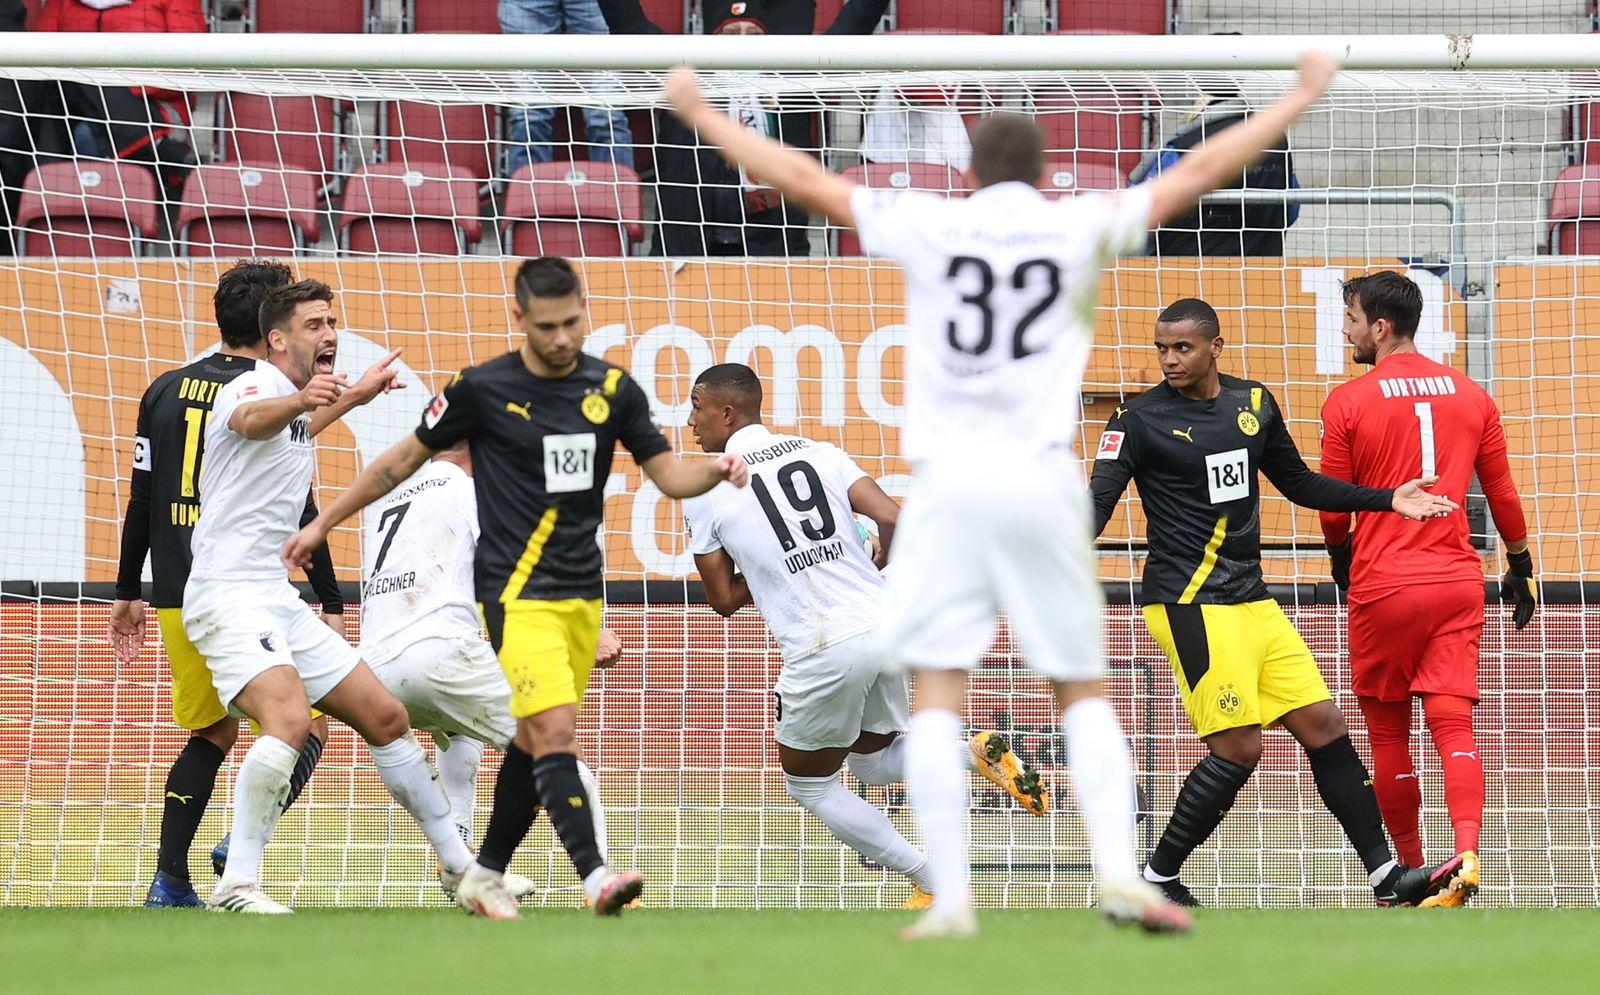 FC Augsburg vs Borussia Dortmund, Germany - 26 Sep 2020